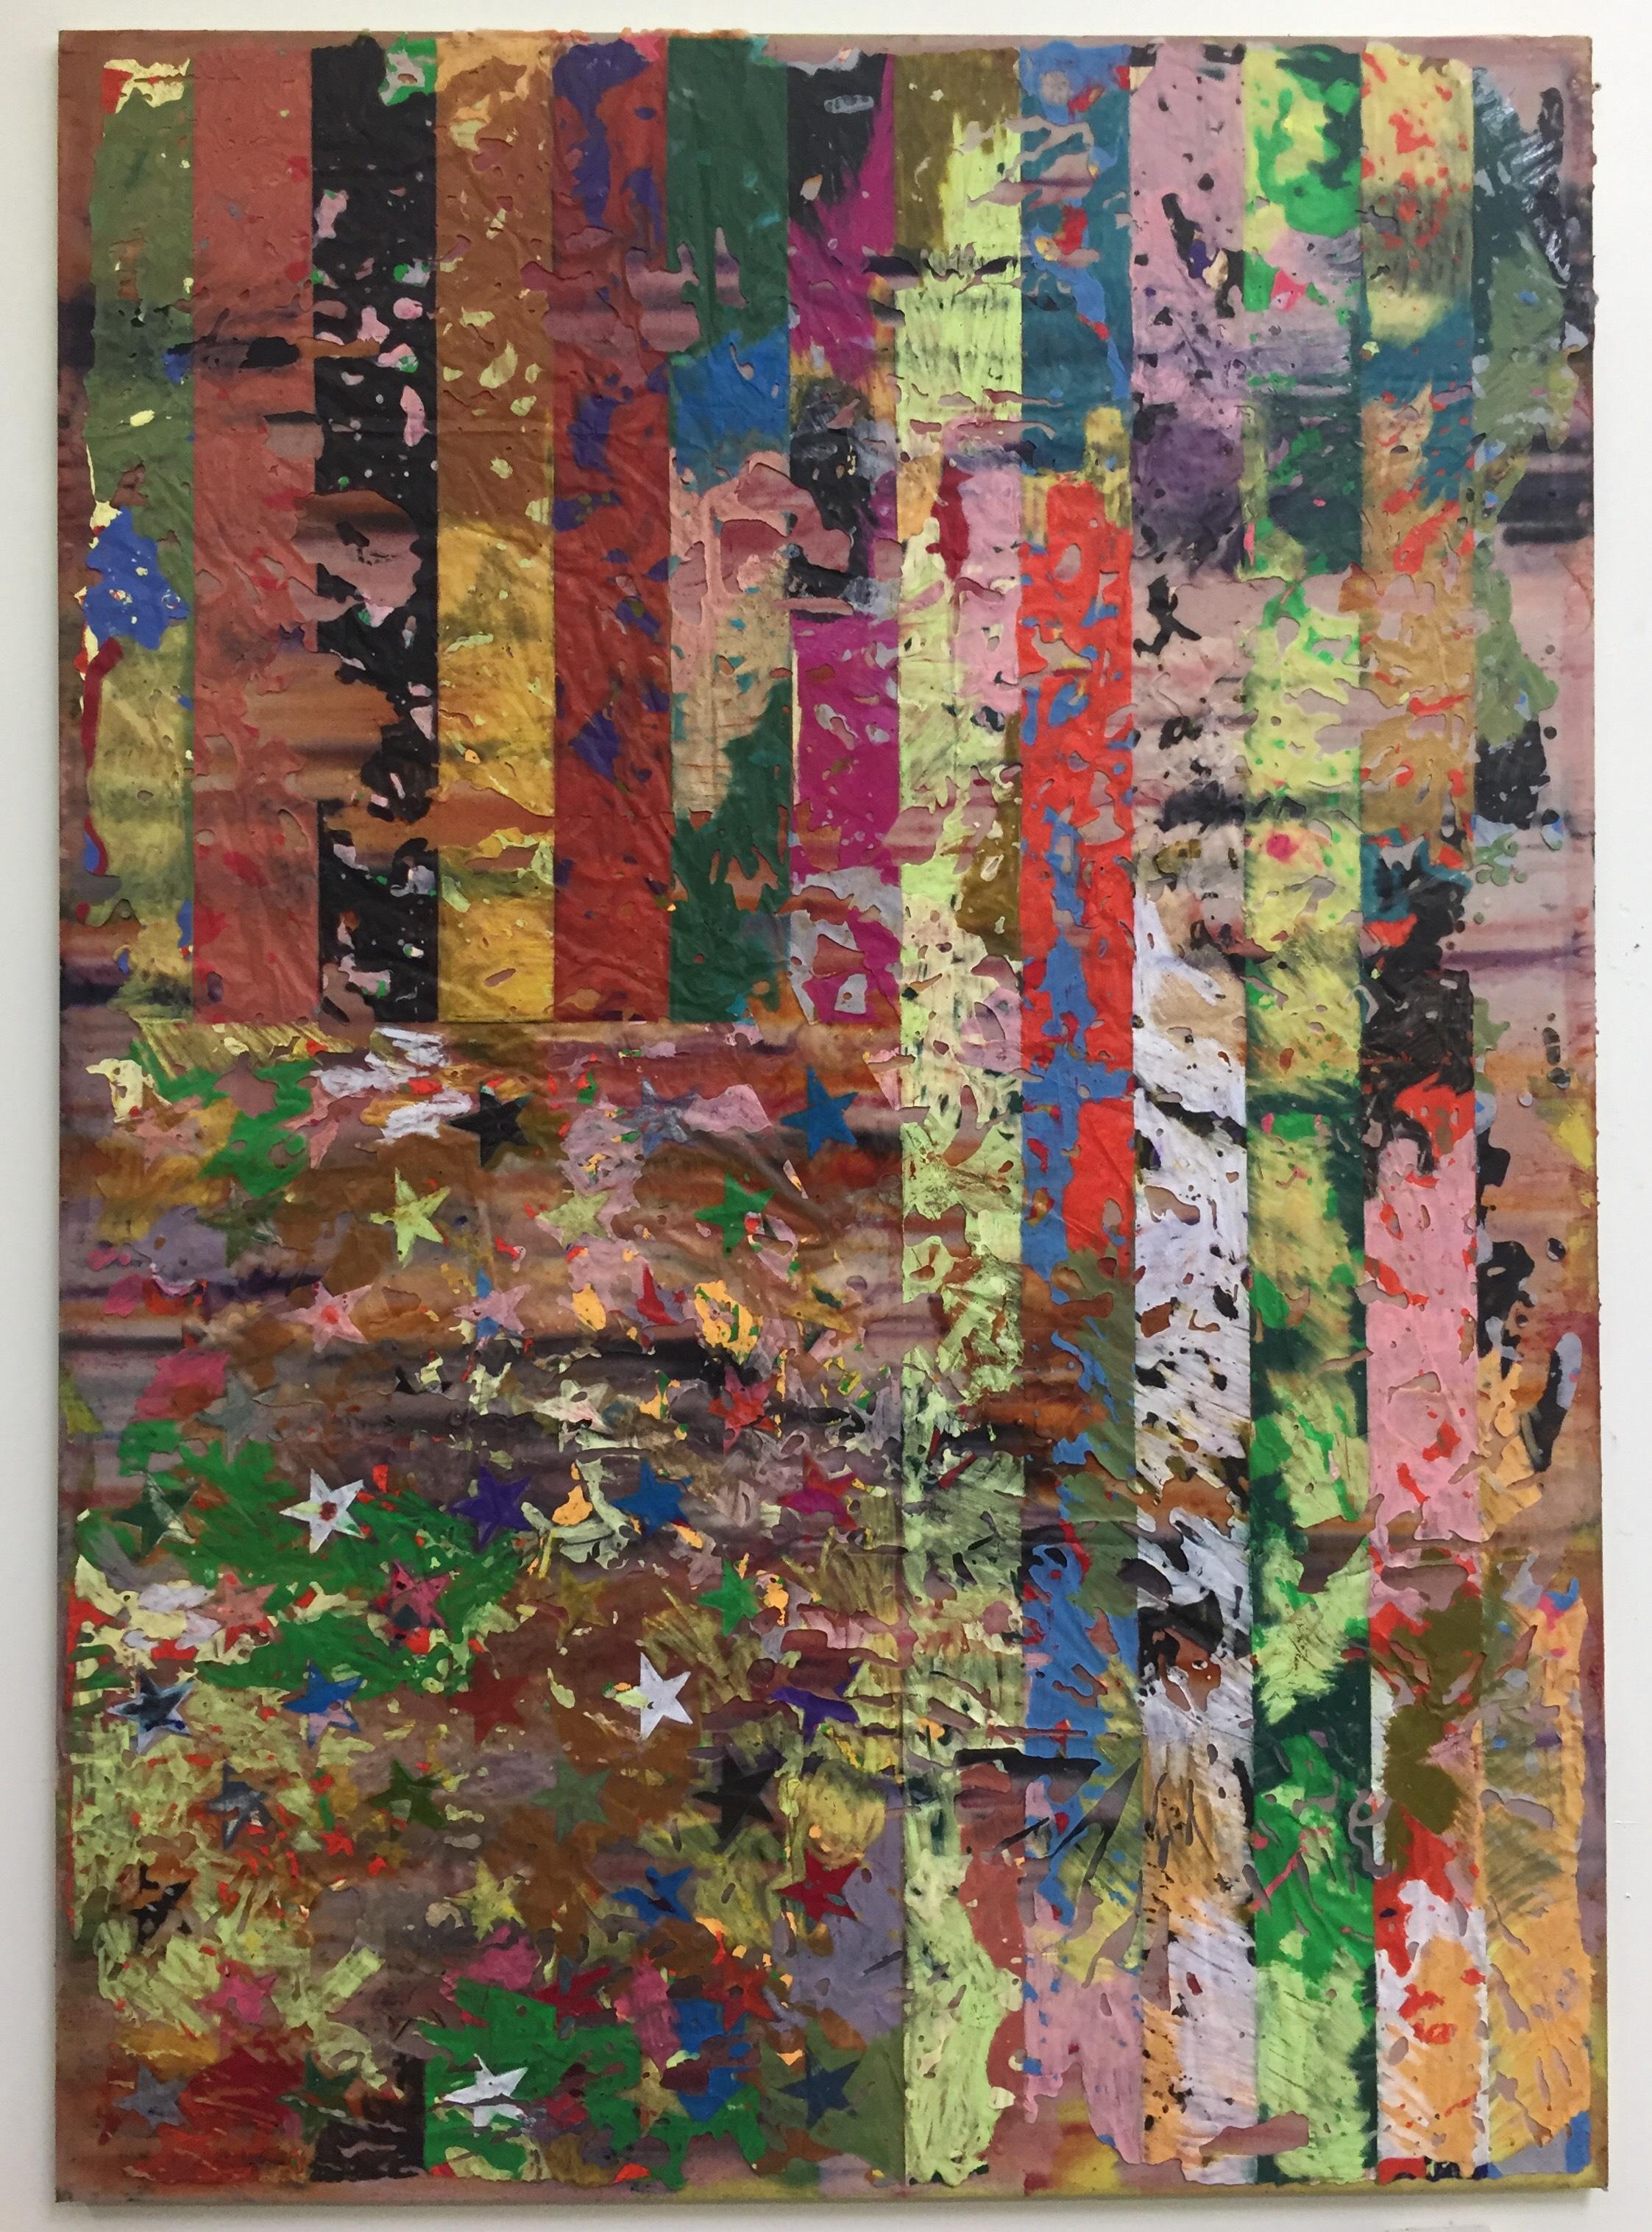 JPW3,  E Pray , 2018, wax transfer, oil pastel on canvas, 84 × 60 in.